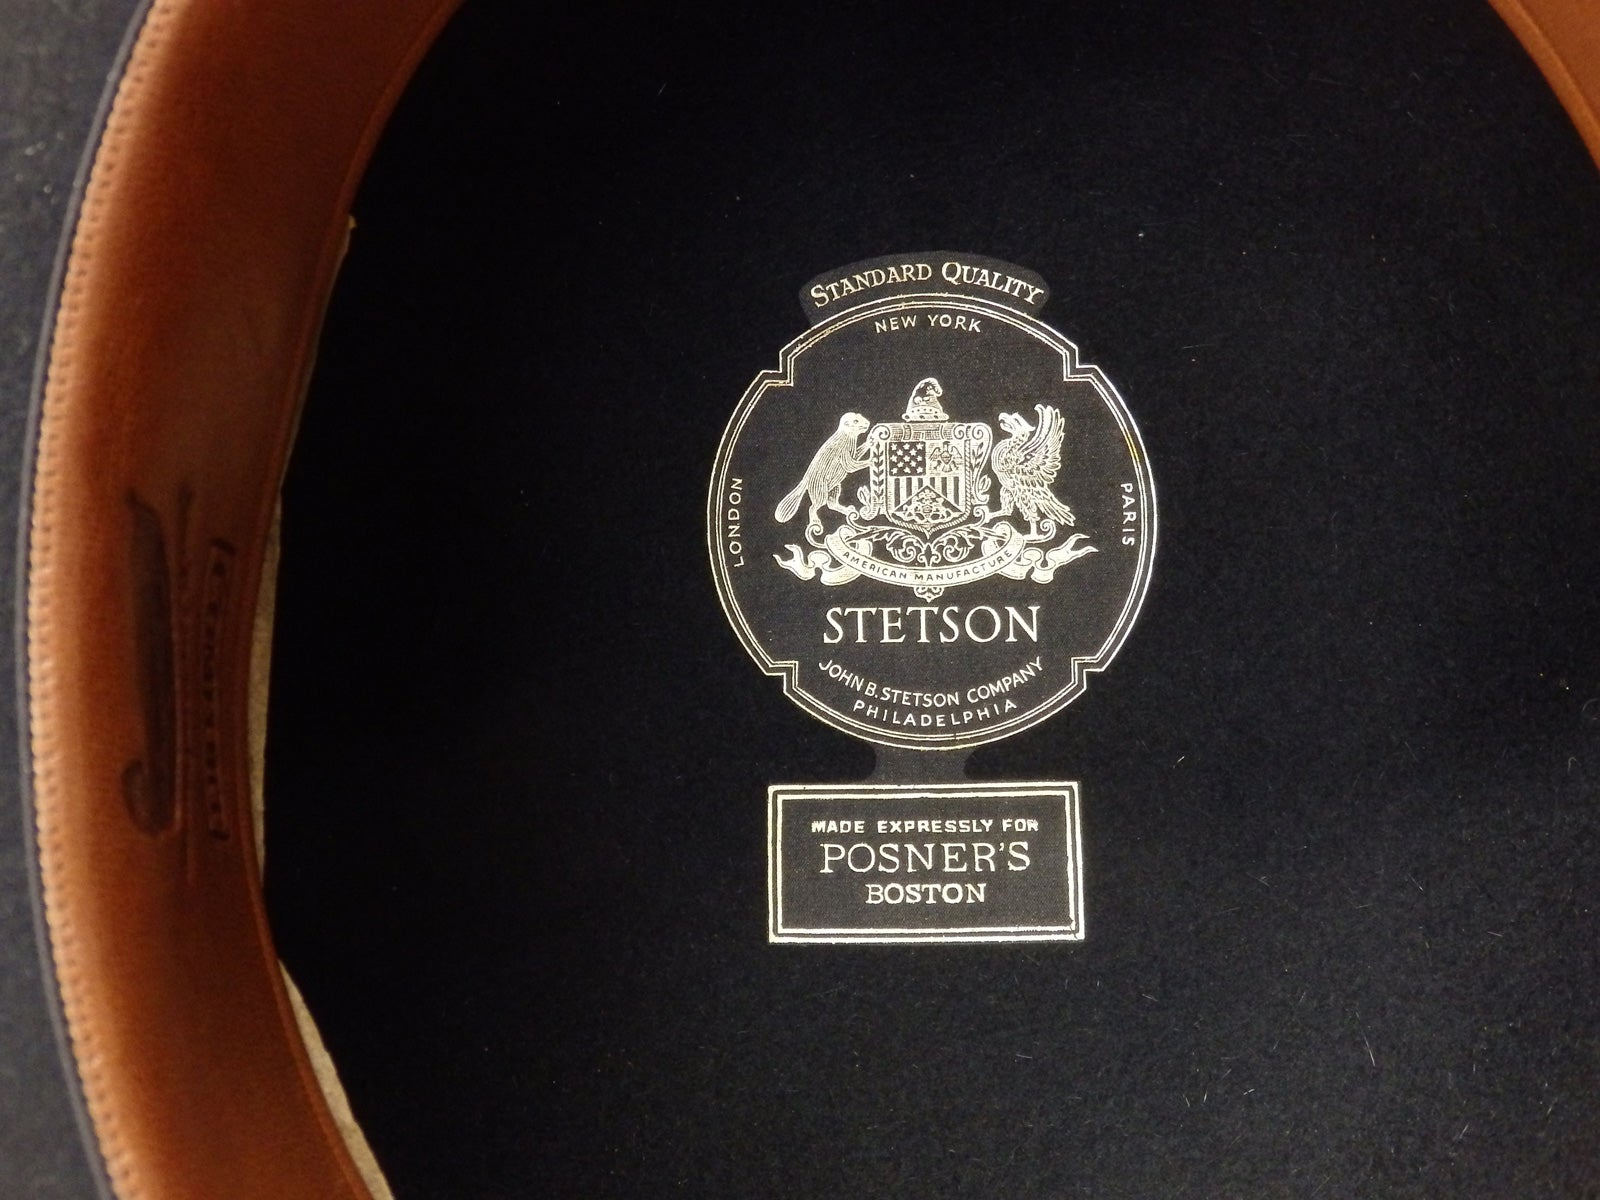 d39c9155 Nicely Preserved John B. Stetson Black Derby For Sale at 1stdibs